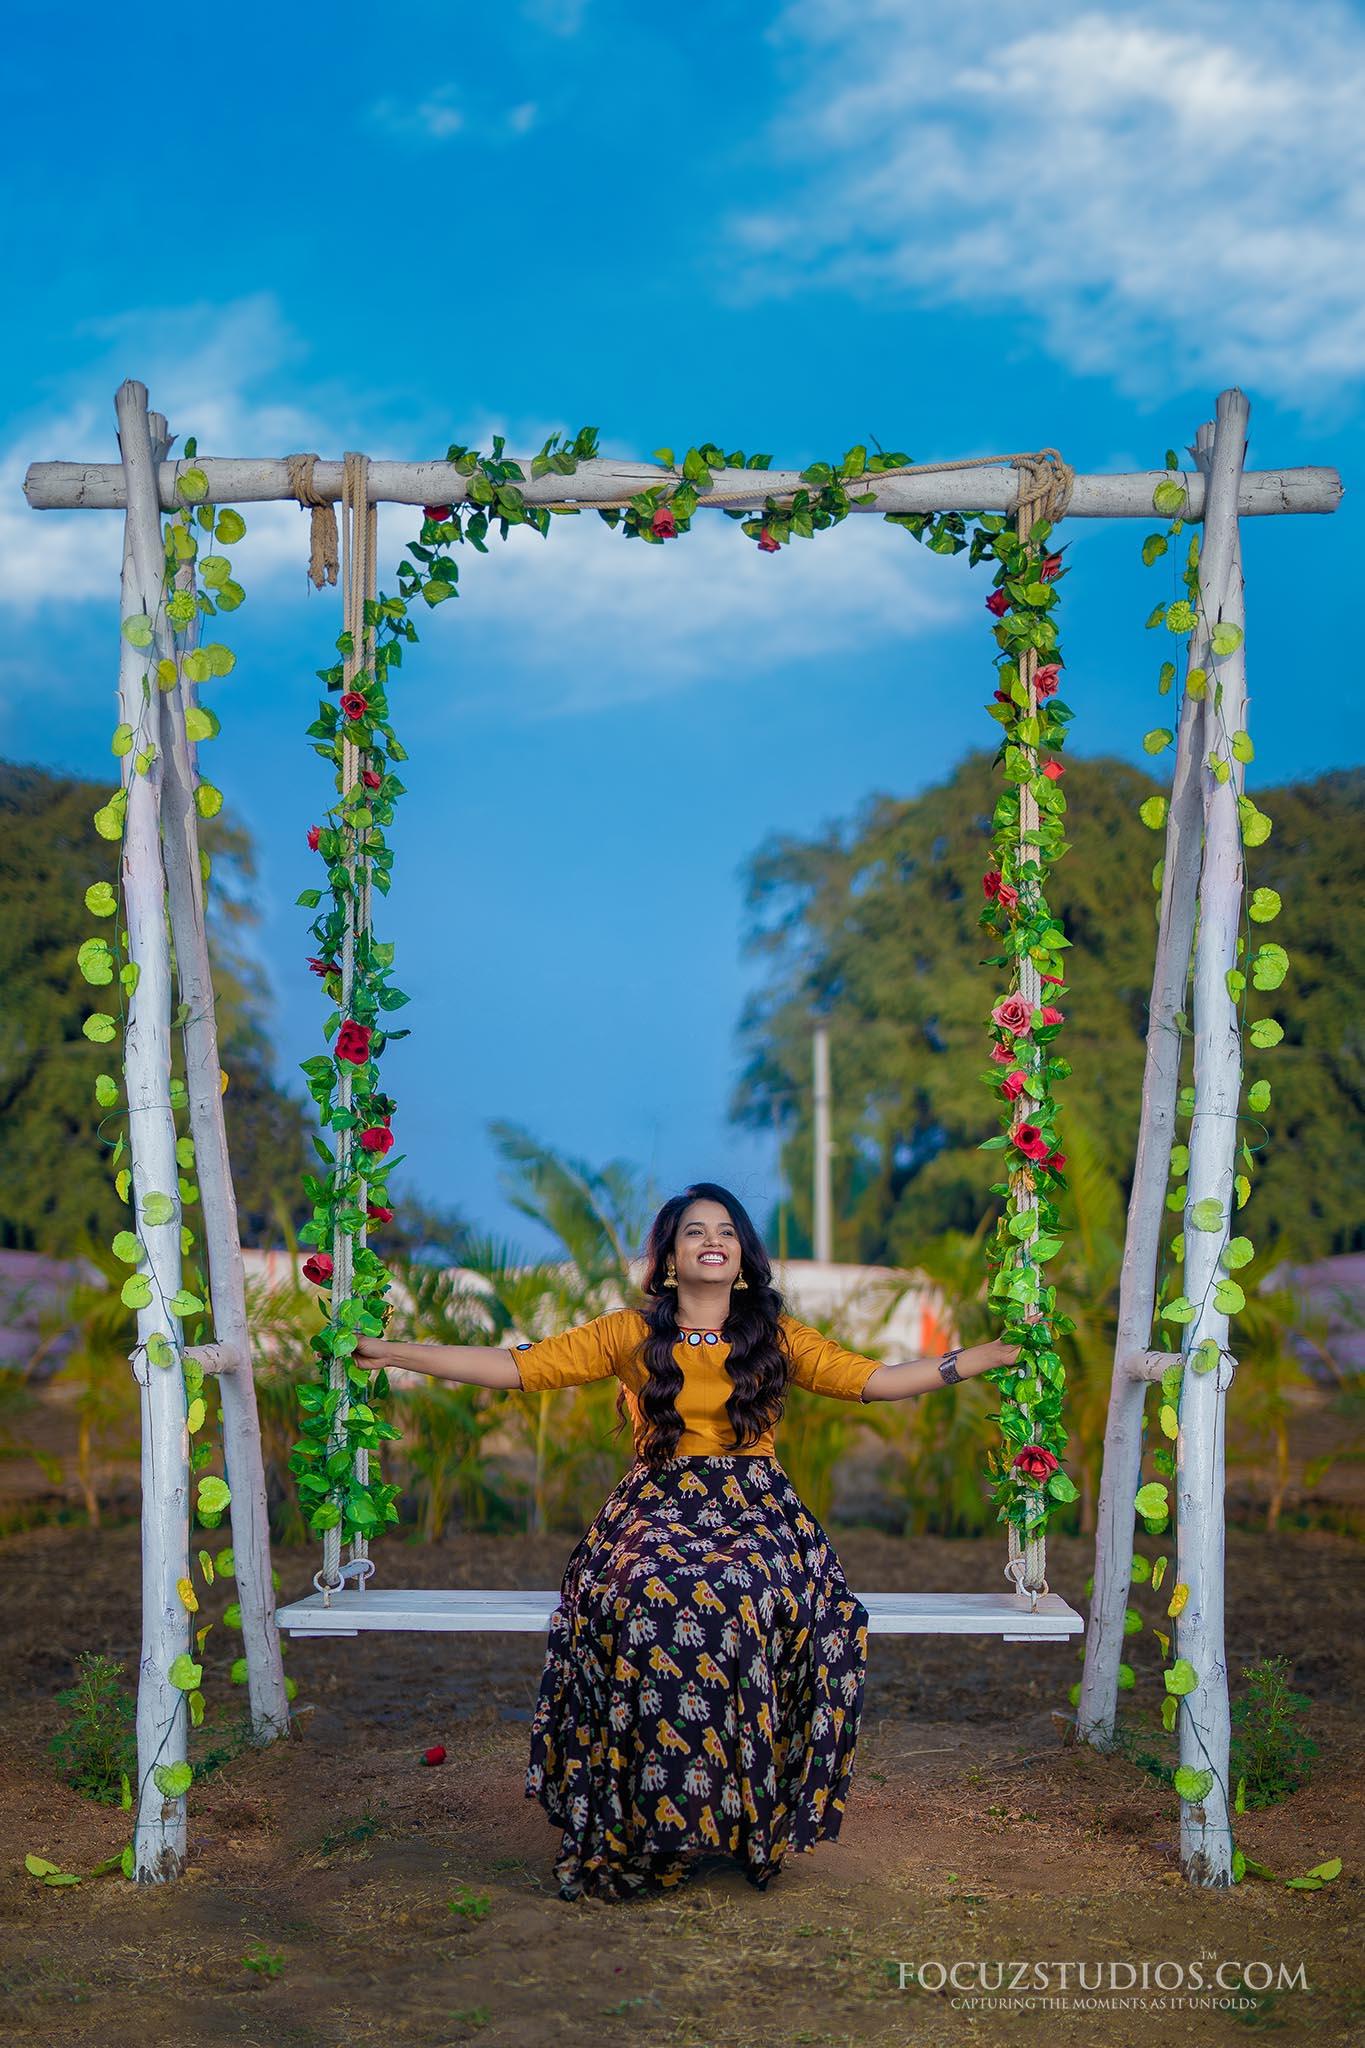 PicturesQ-Studio-focuz-studio-hyderabad-pre-wedding-shoot-10